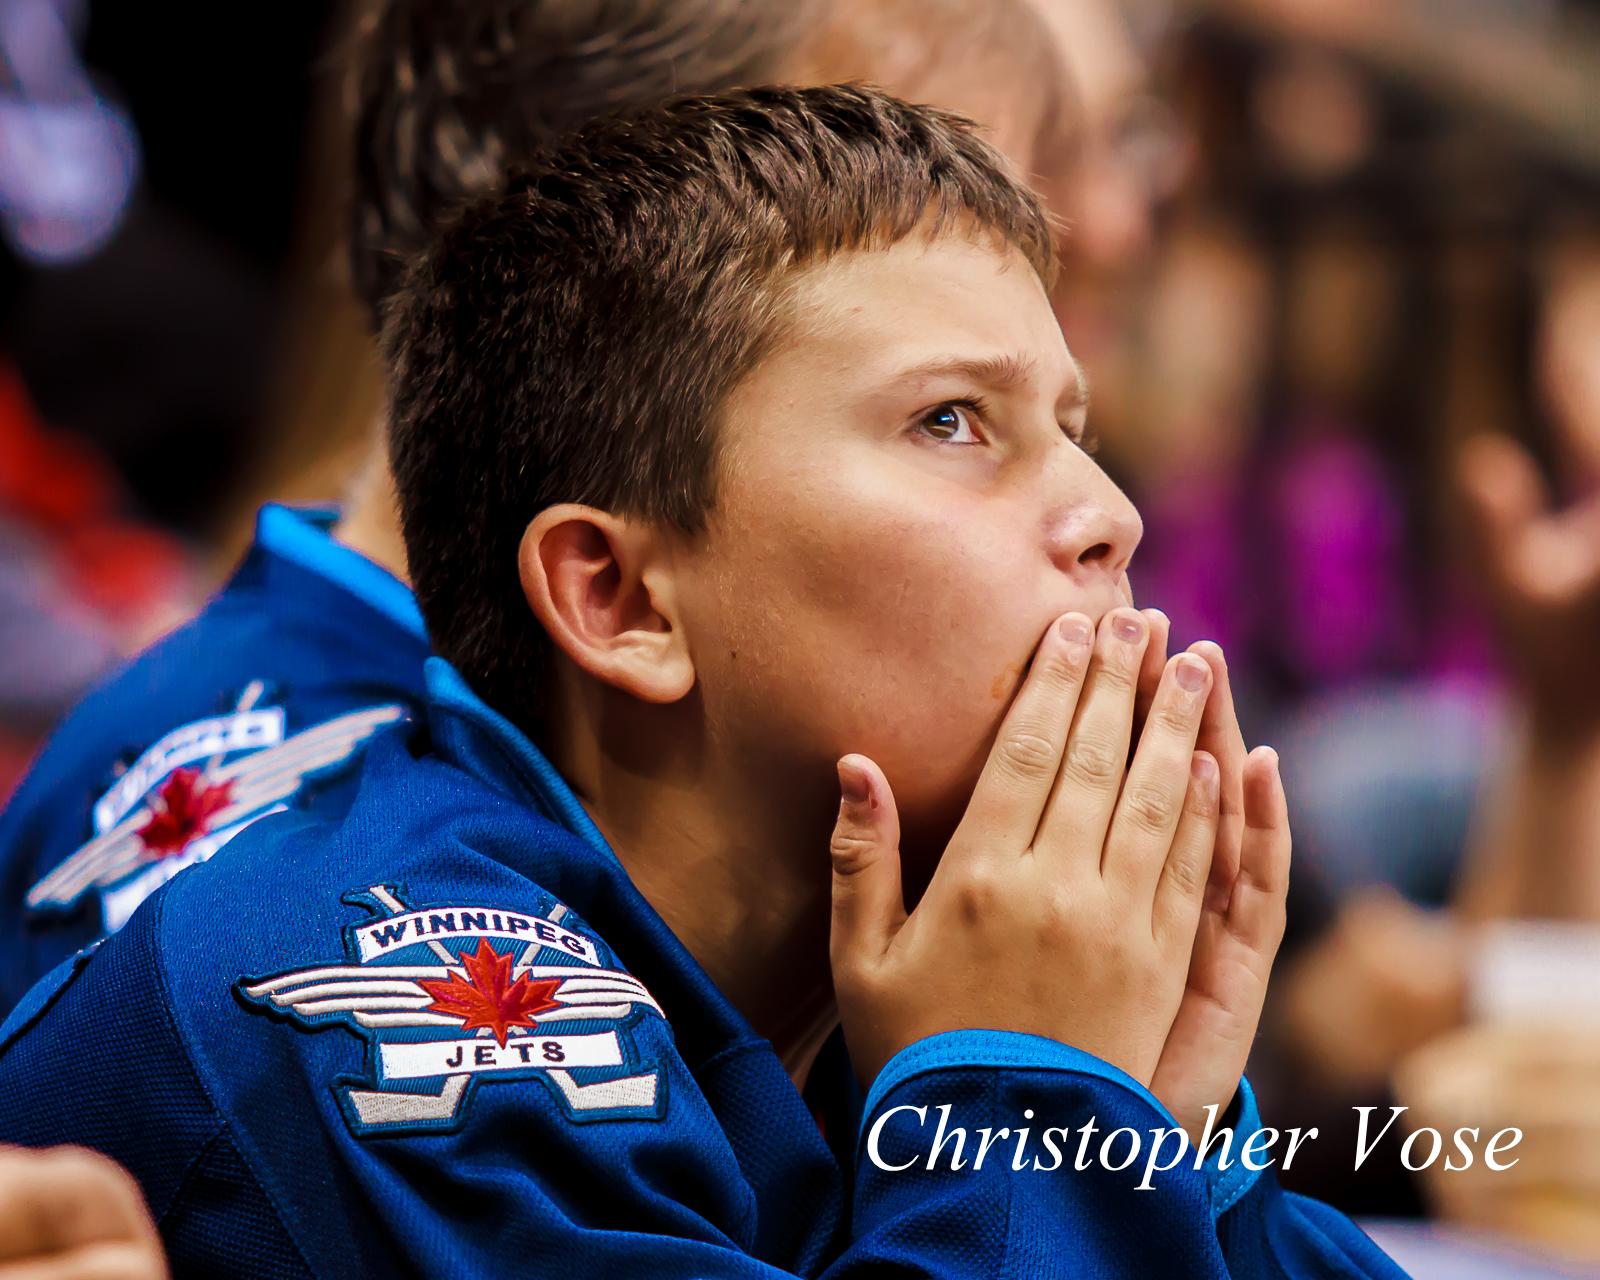 2014-09-26 Winnipeg Jets Supporter.jpg